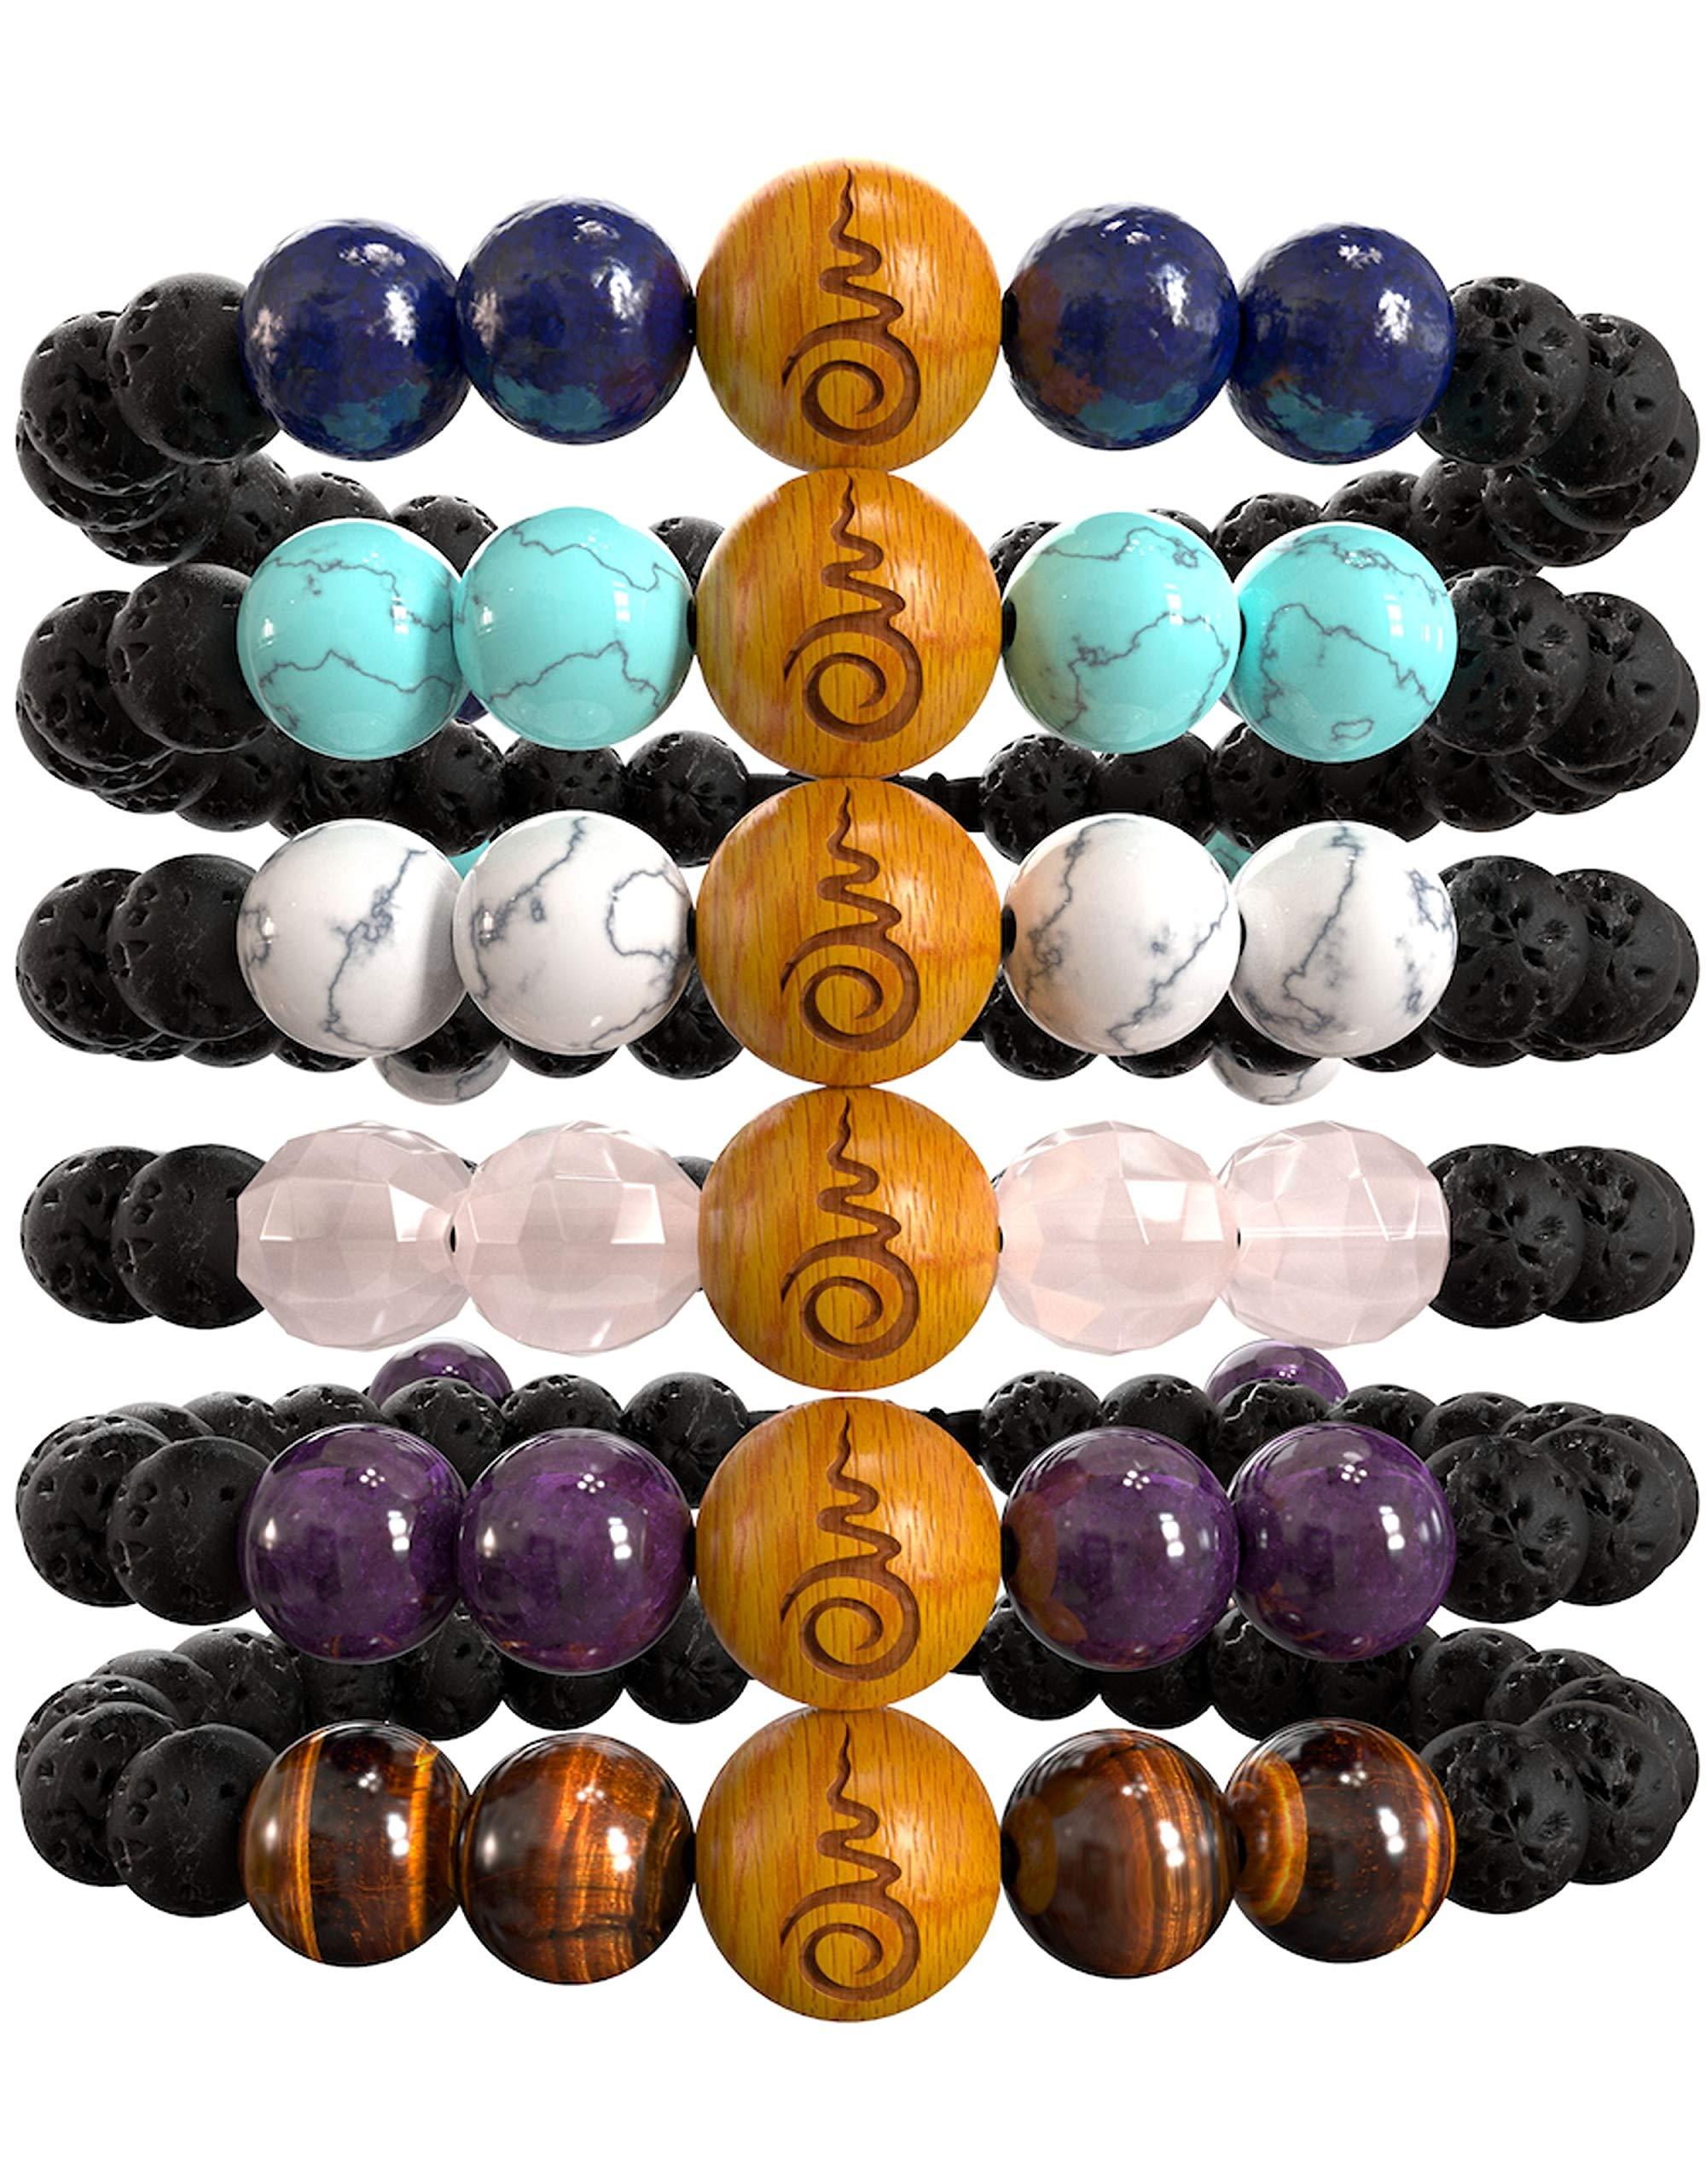 Set of 6 Boho Beaded Anxiety Bracelets for Women   Braclets with Rose Quartz, Amethyst, Tiger's Eye, Lapis Lazuli, Blue & White Howlites, Lavarock & Sandalwood. Gift Box. Gift Card + Extra Satin Bag by BE HERE NOW